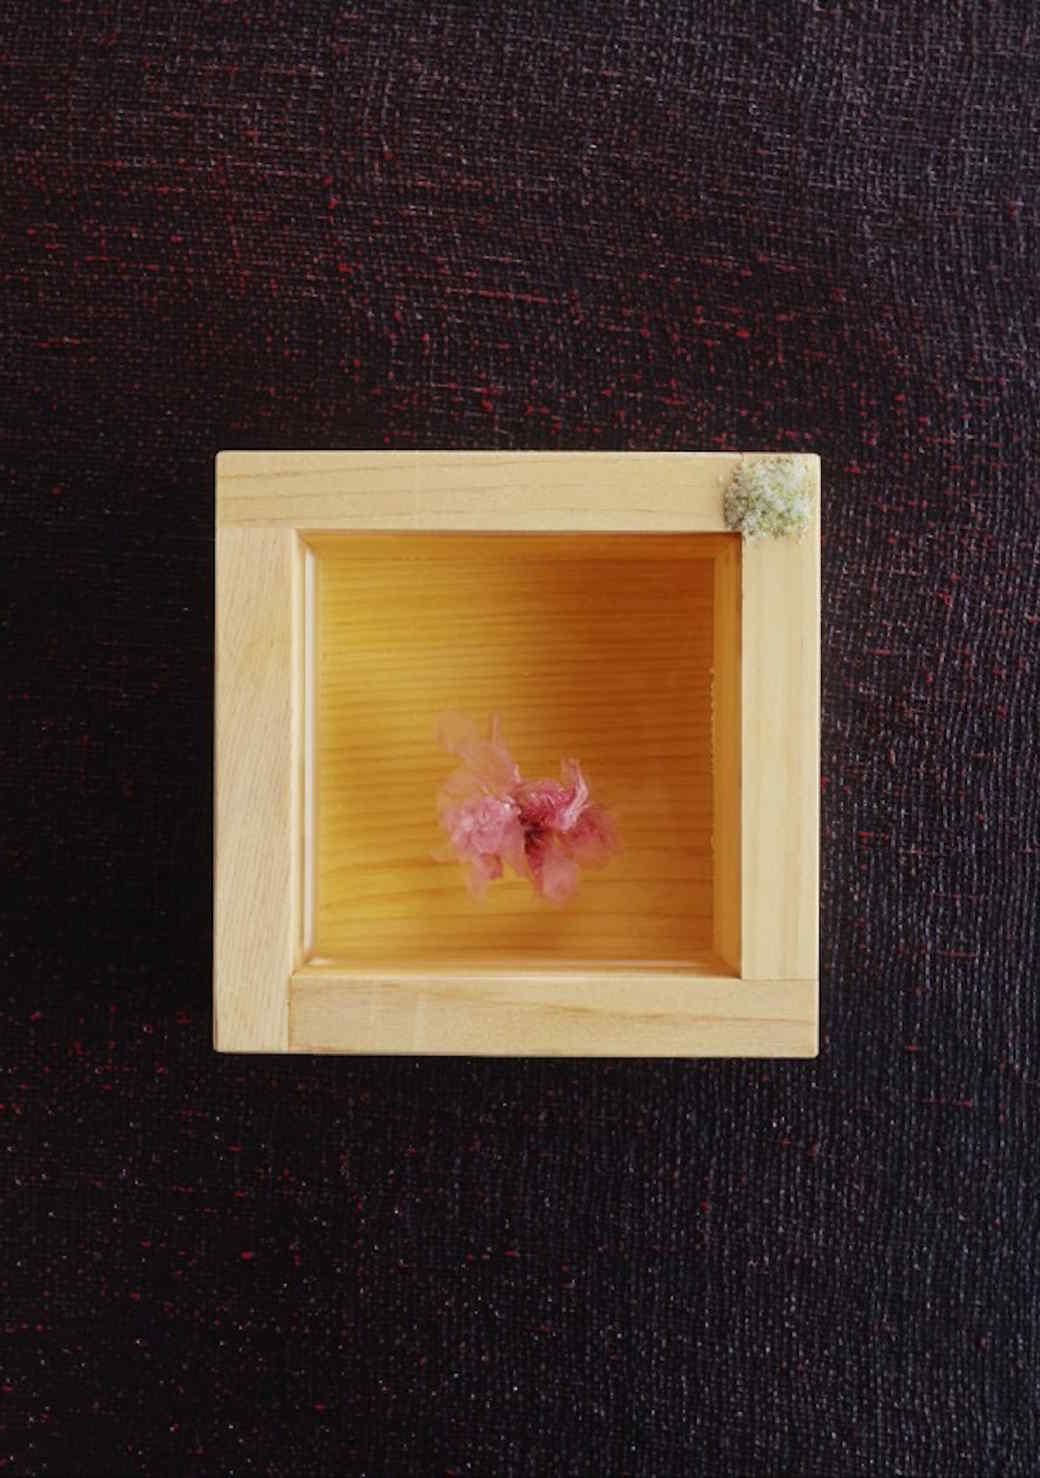 sushi-seki-cherry-blossom-cocktail-0316.jpeg (skyword:244844)